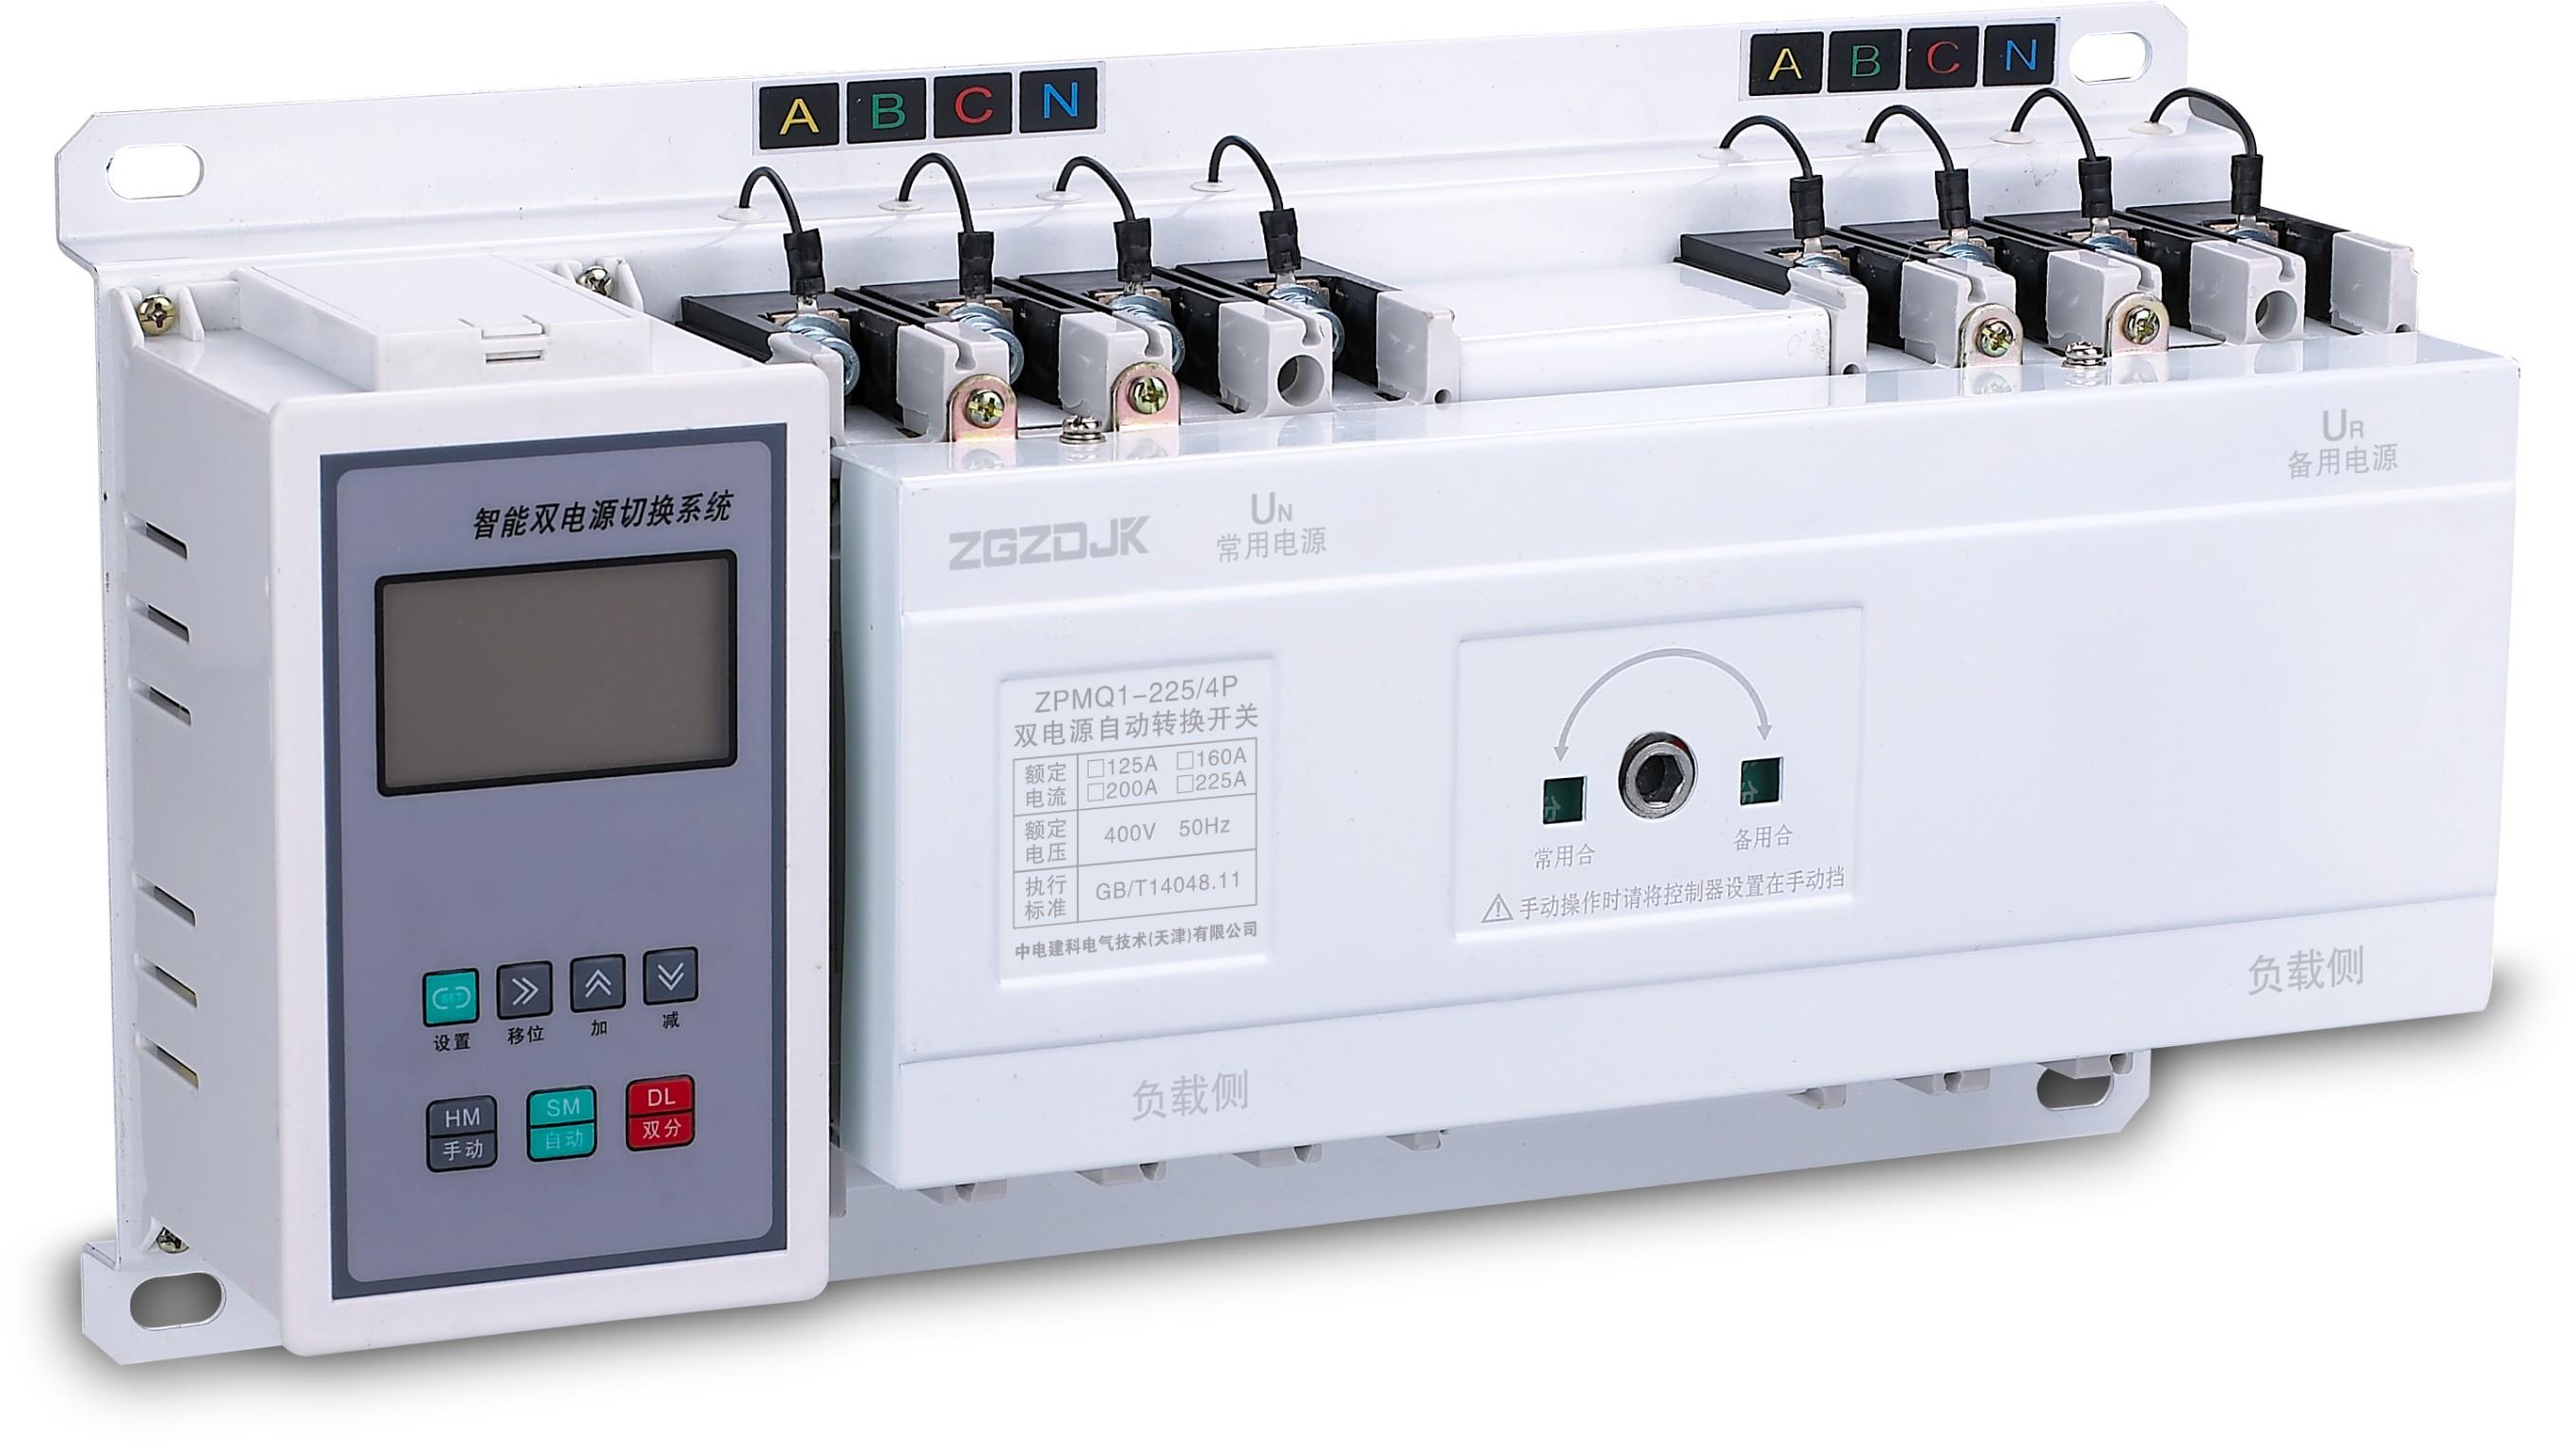 ZPMQ1(智能型)双电源自动转换开关